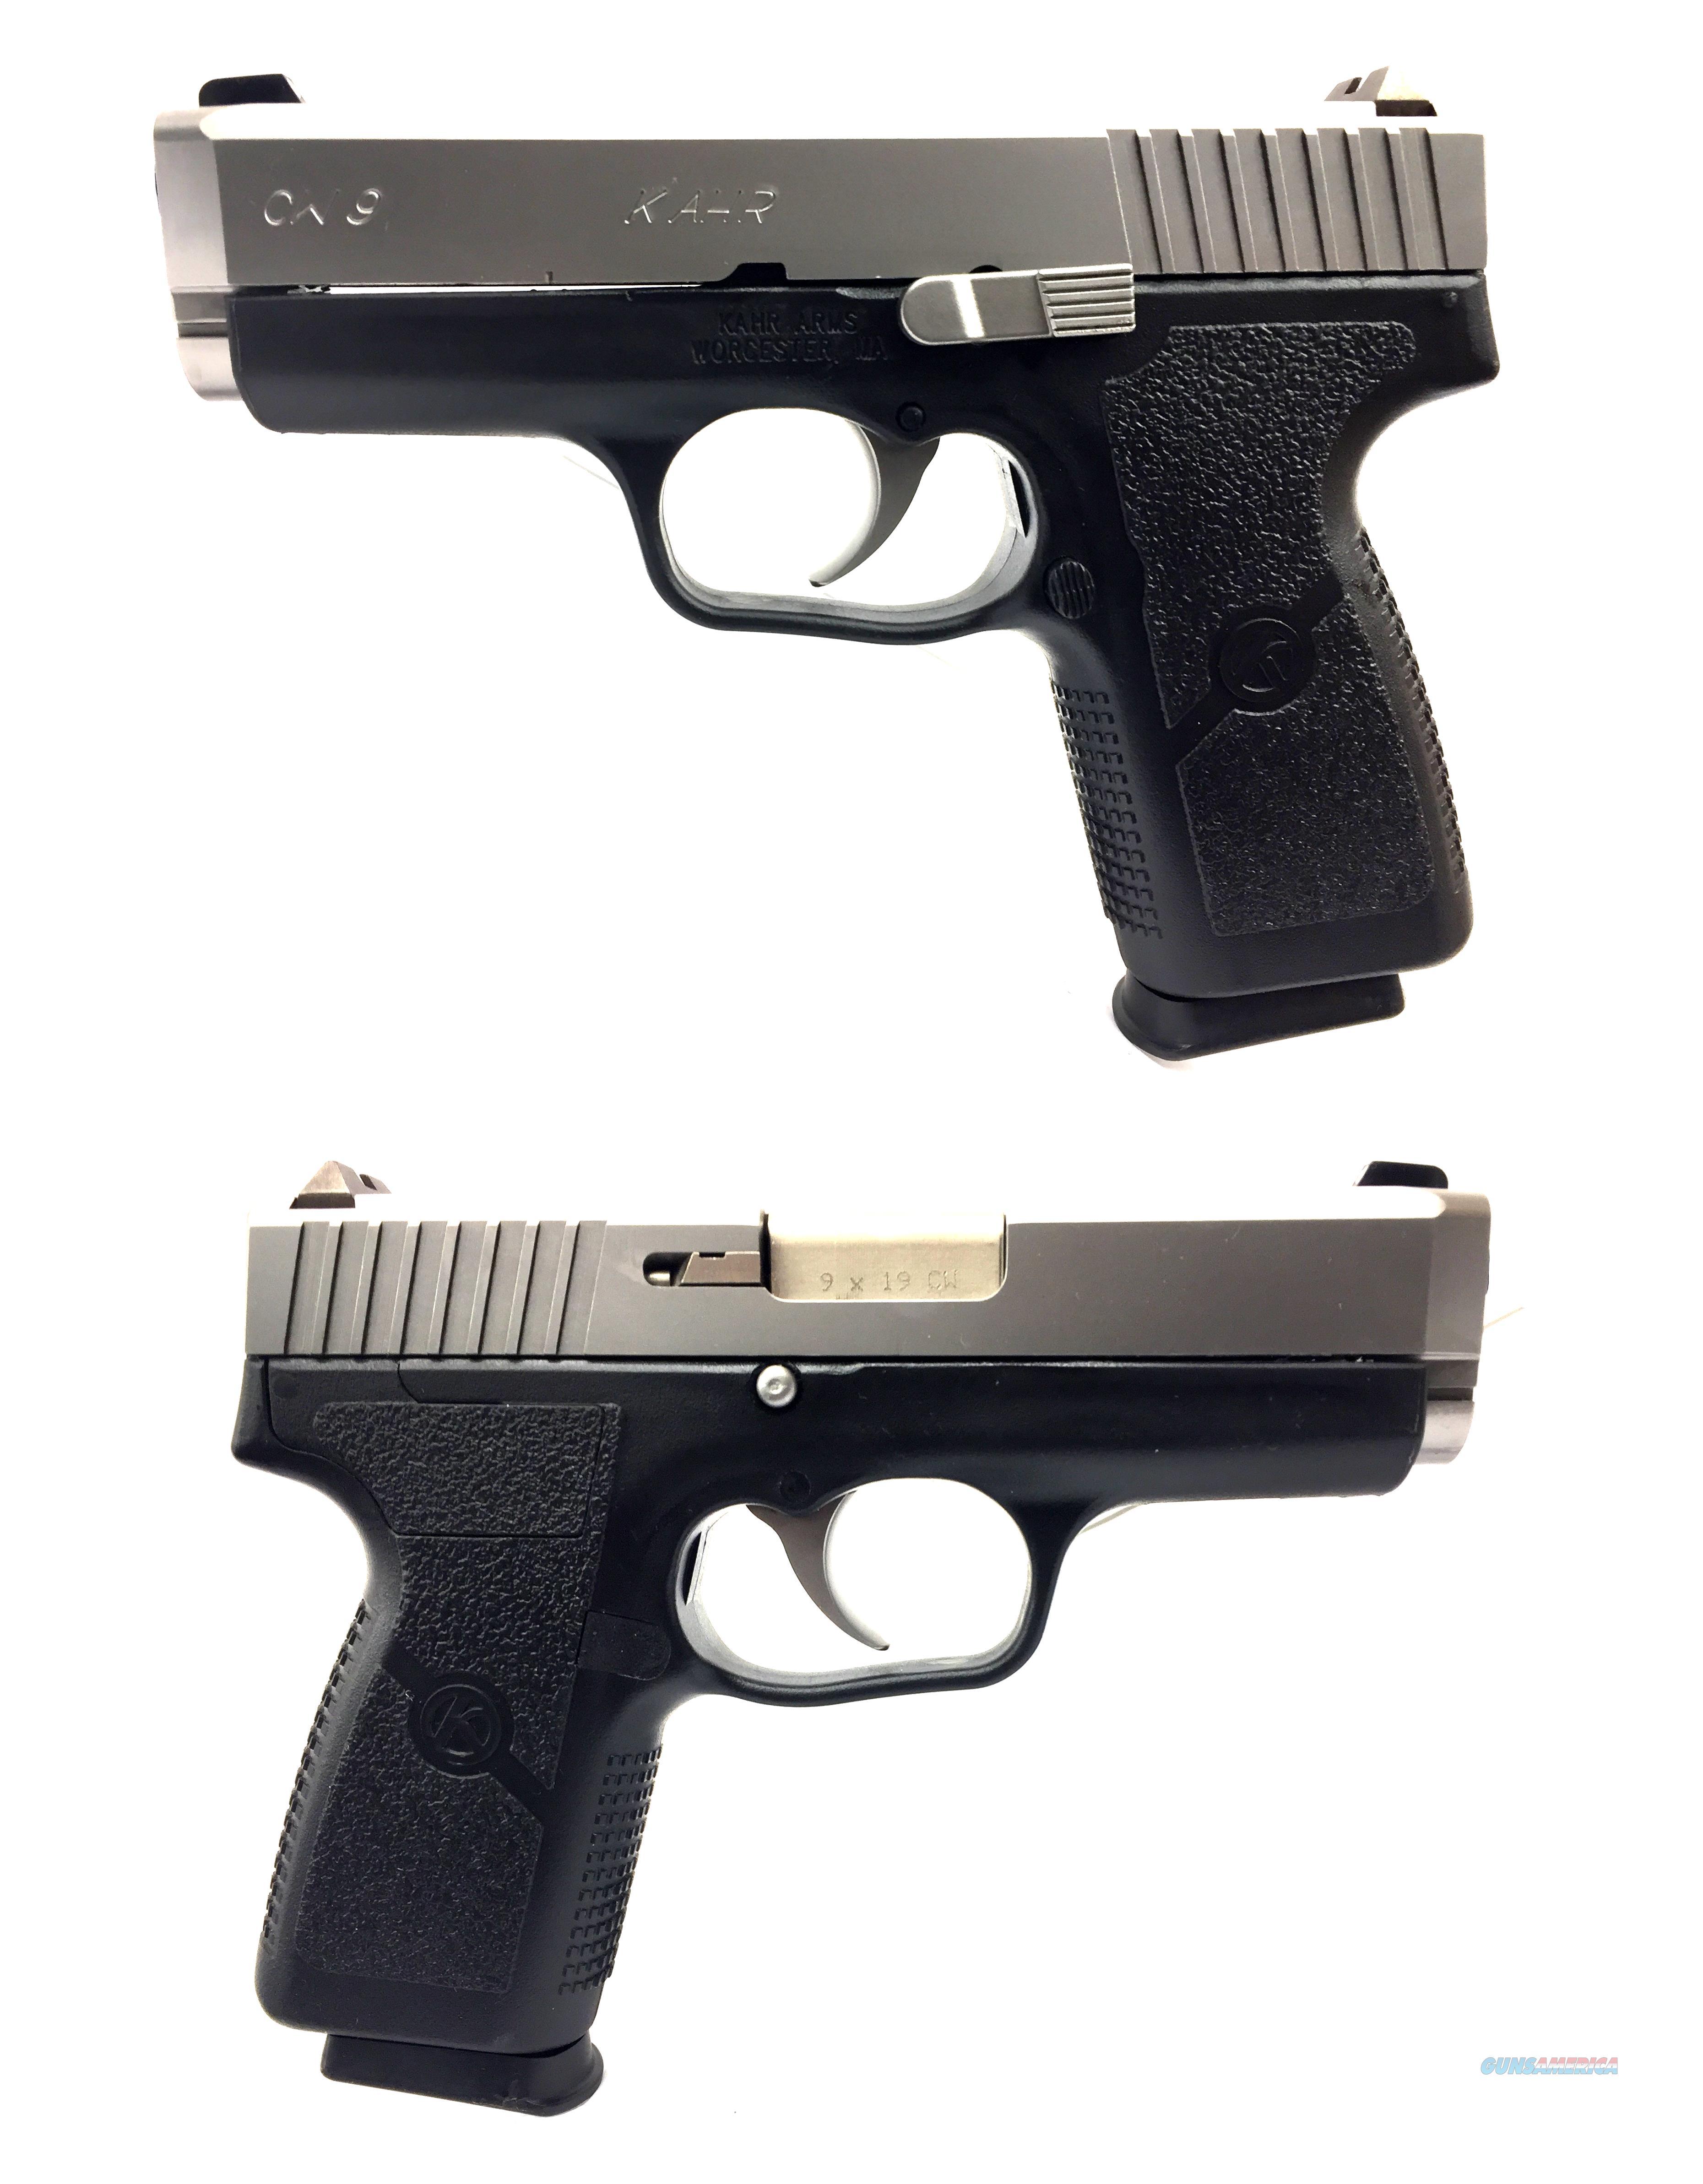 Kahr CW 9 Semi-Automatic Pistol  Guns > Pistols > Kahr Pistols